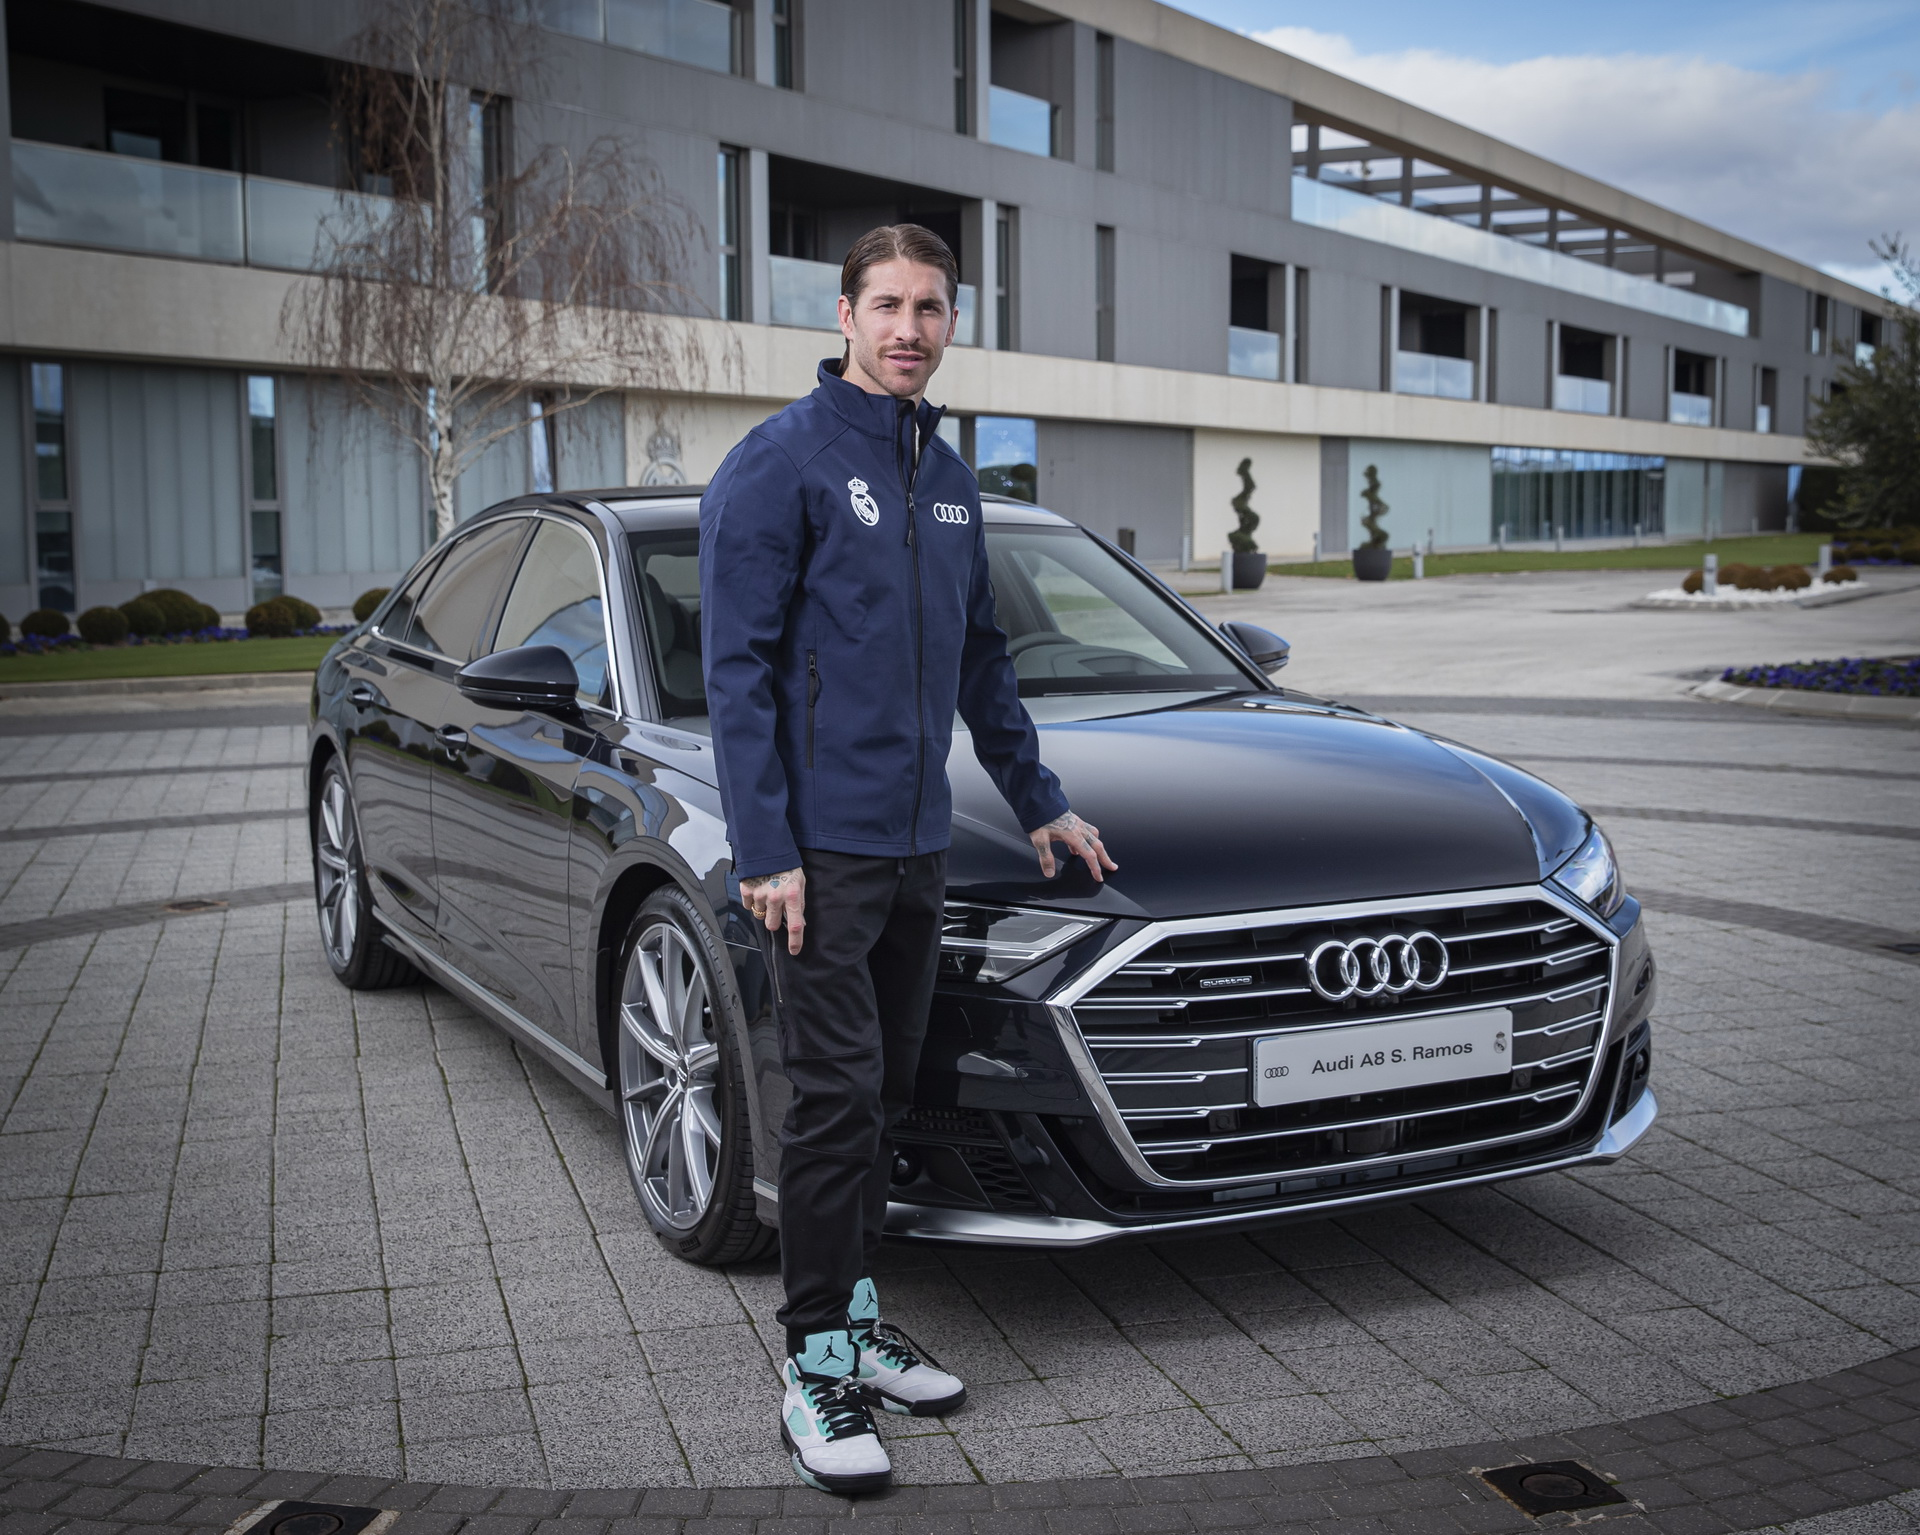 Real_Madrid_Players_Audi_0000